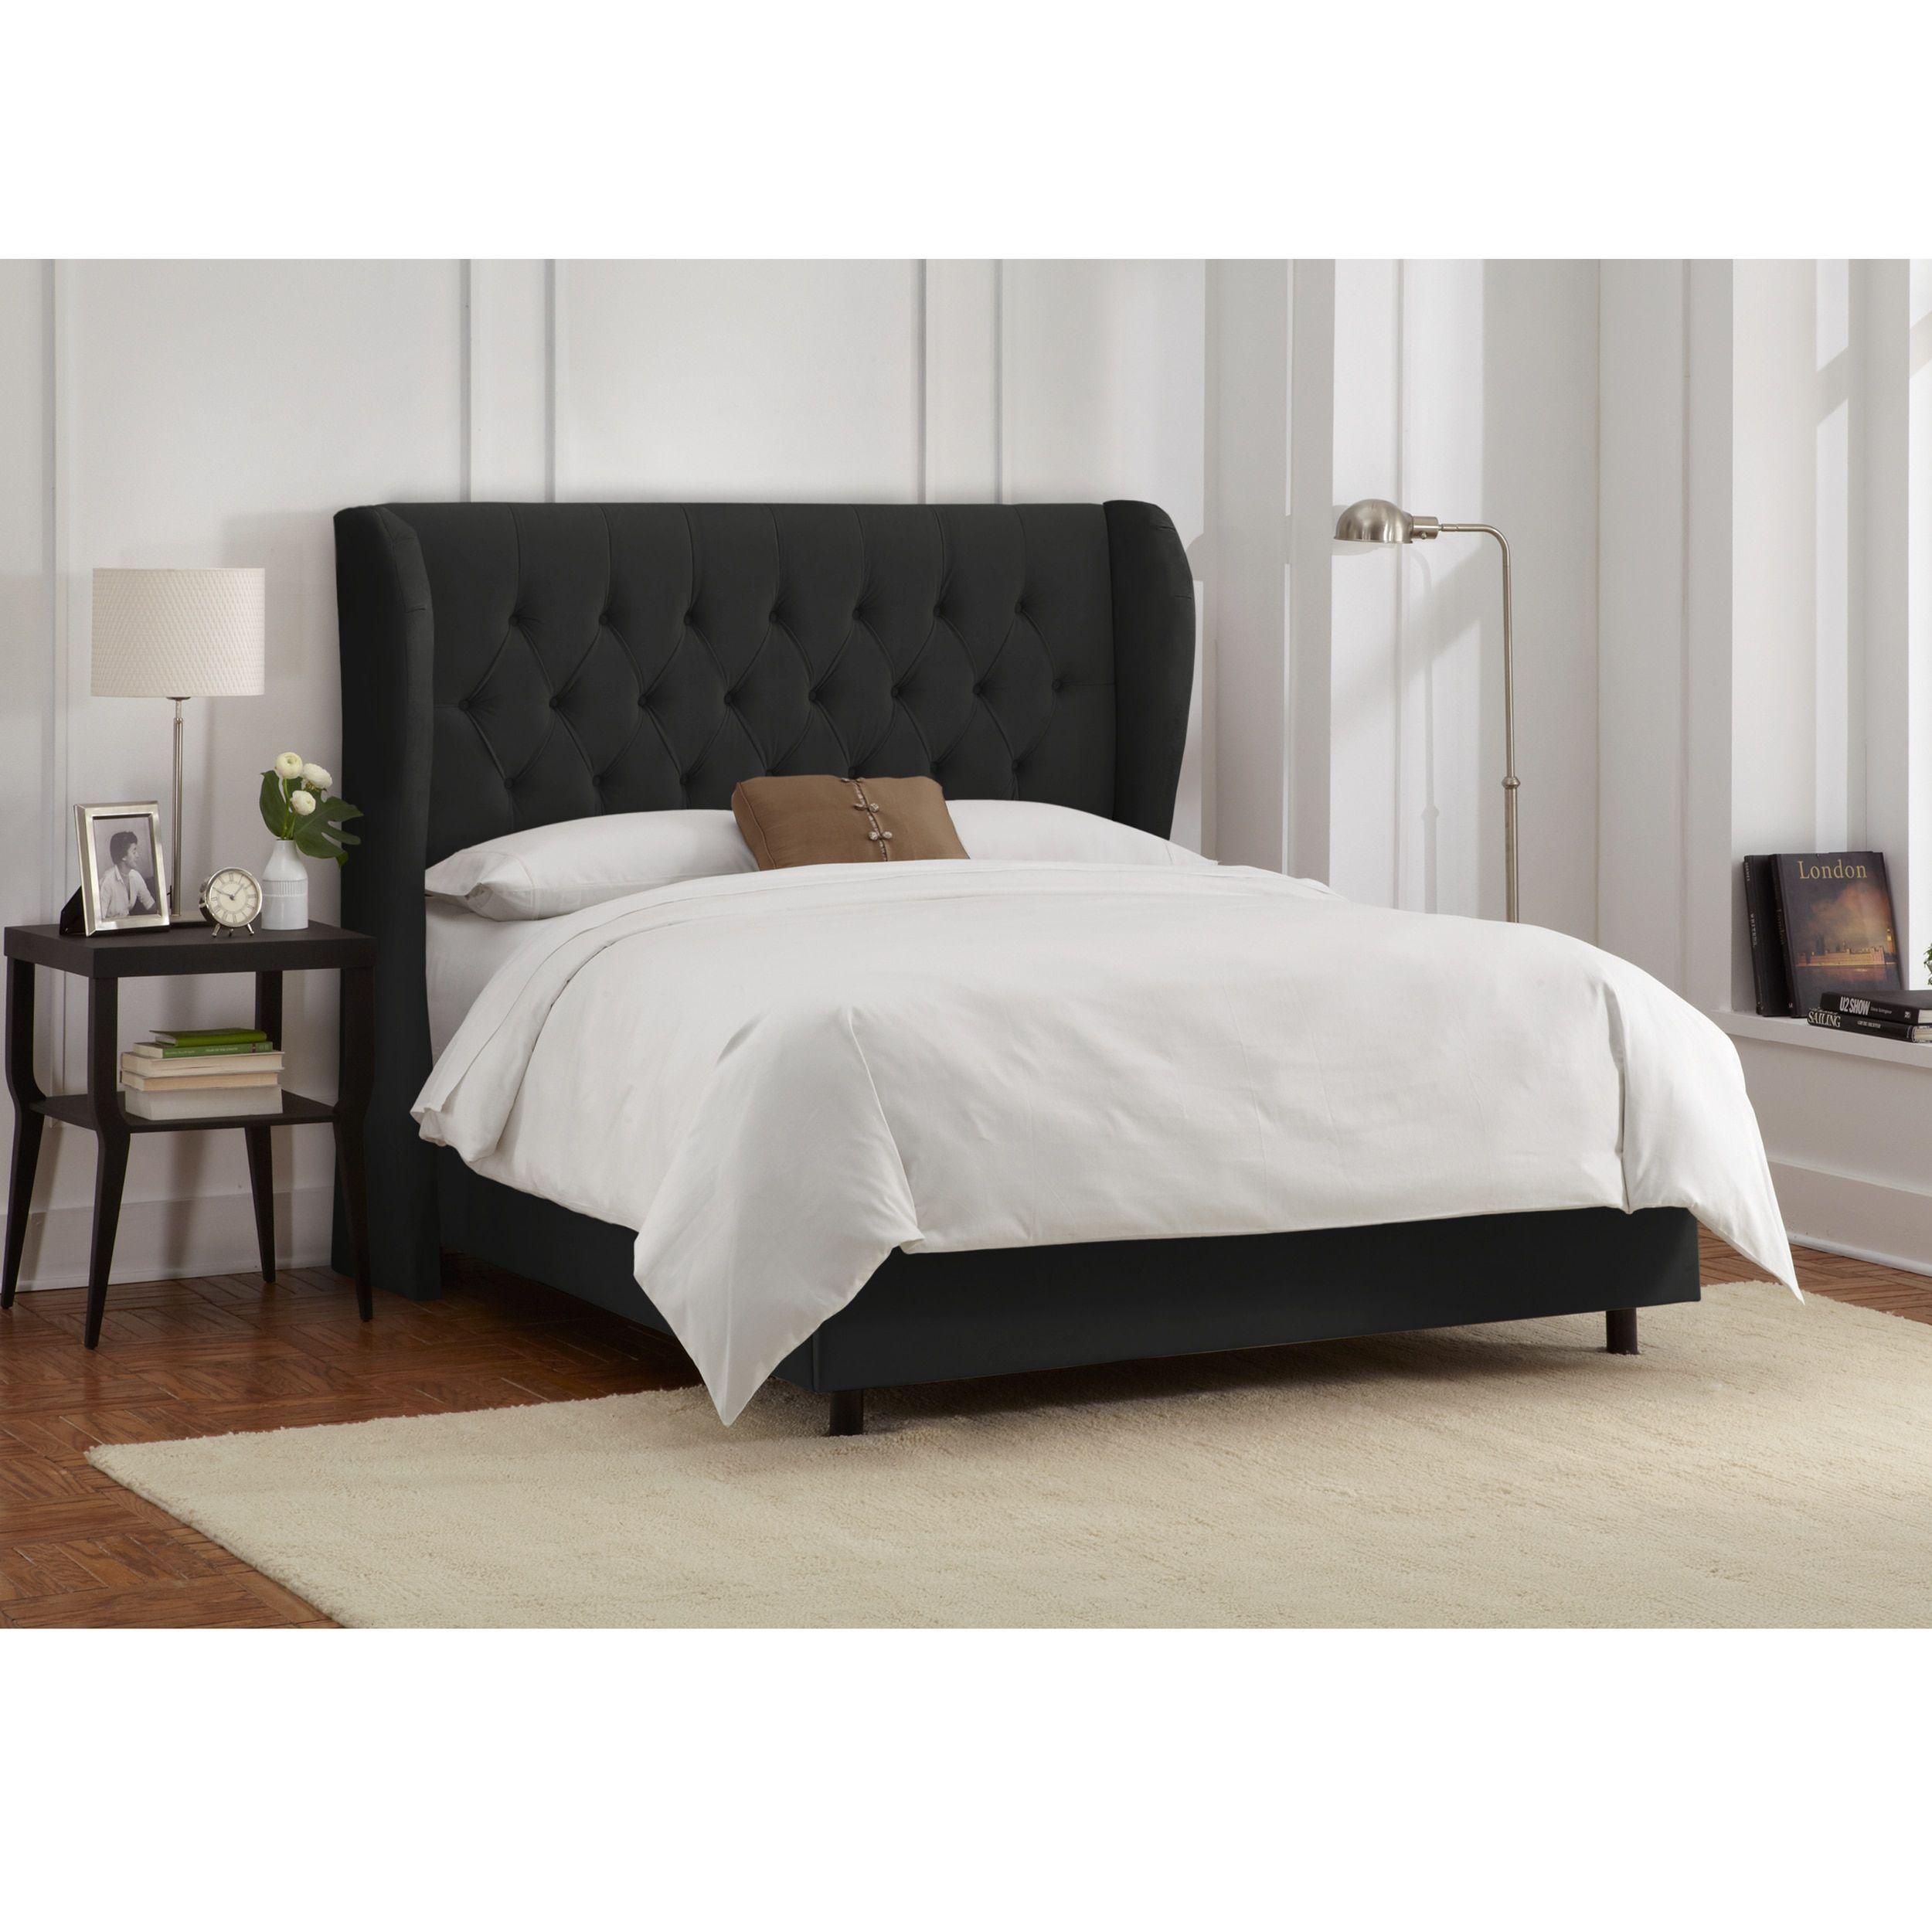 Skyline Furniture Tufted Wingback Bed in Velvet Black (California ...